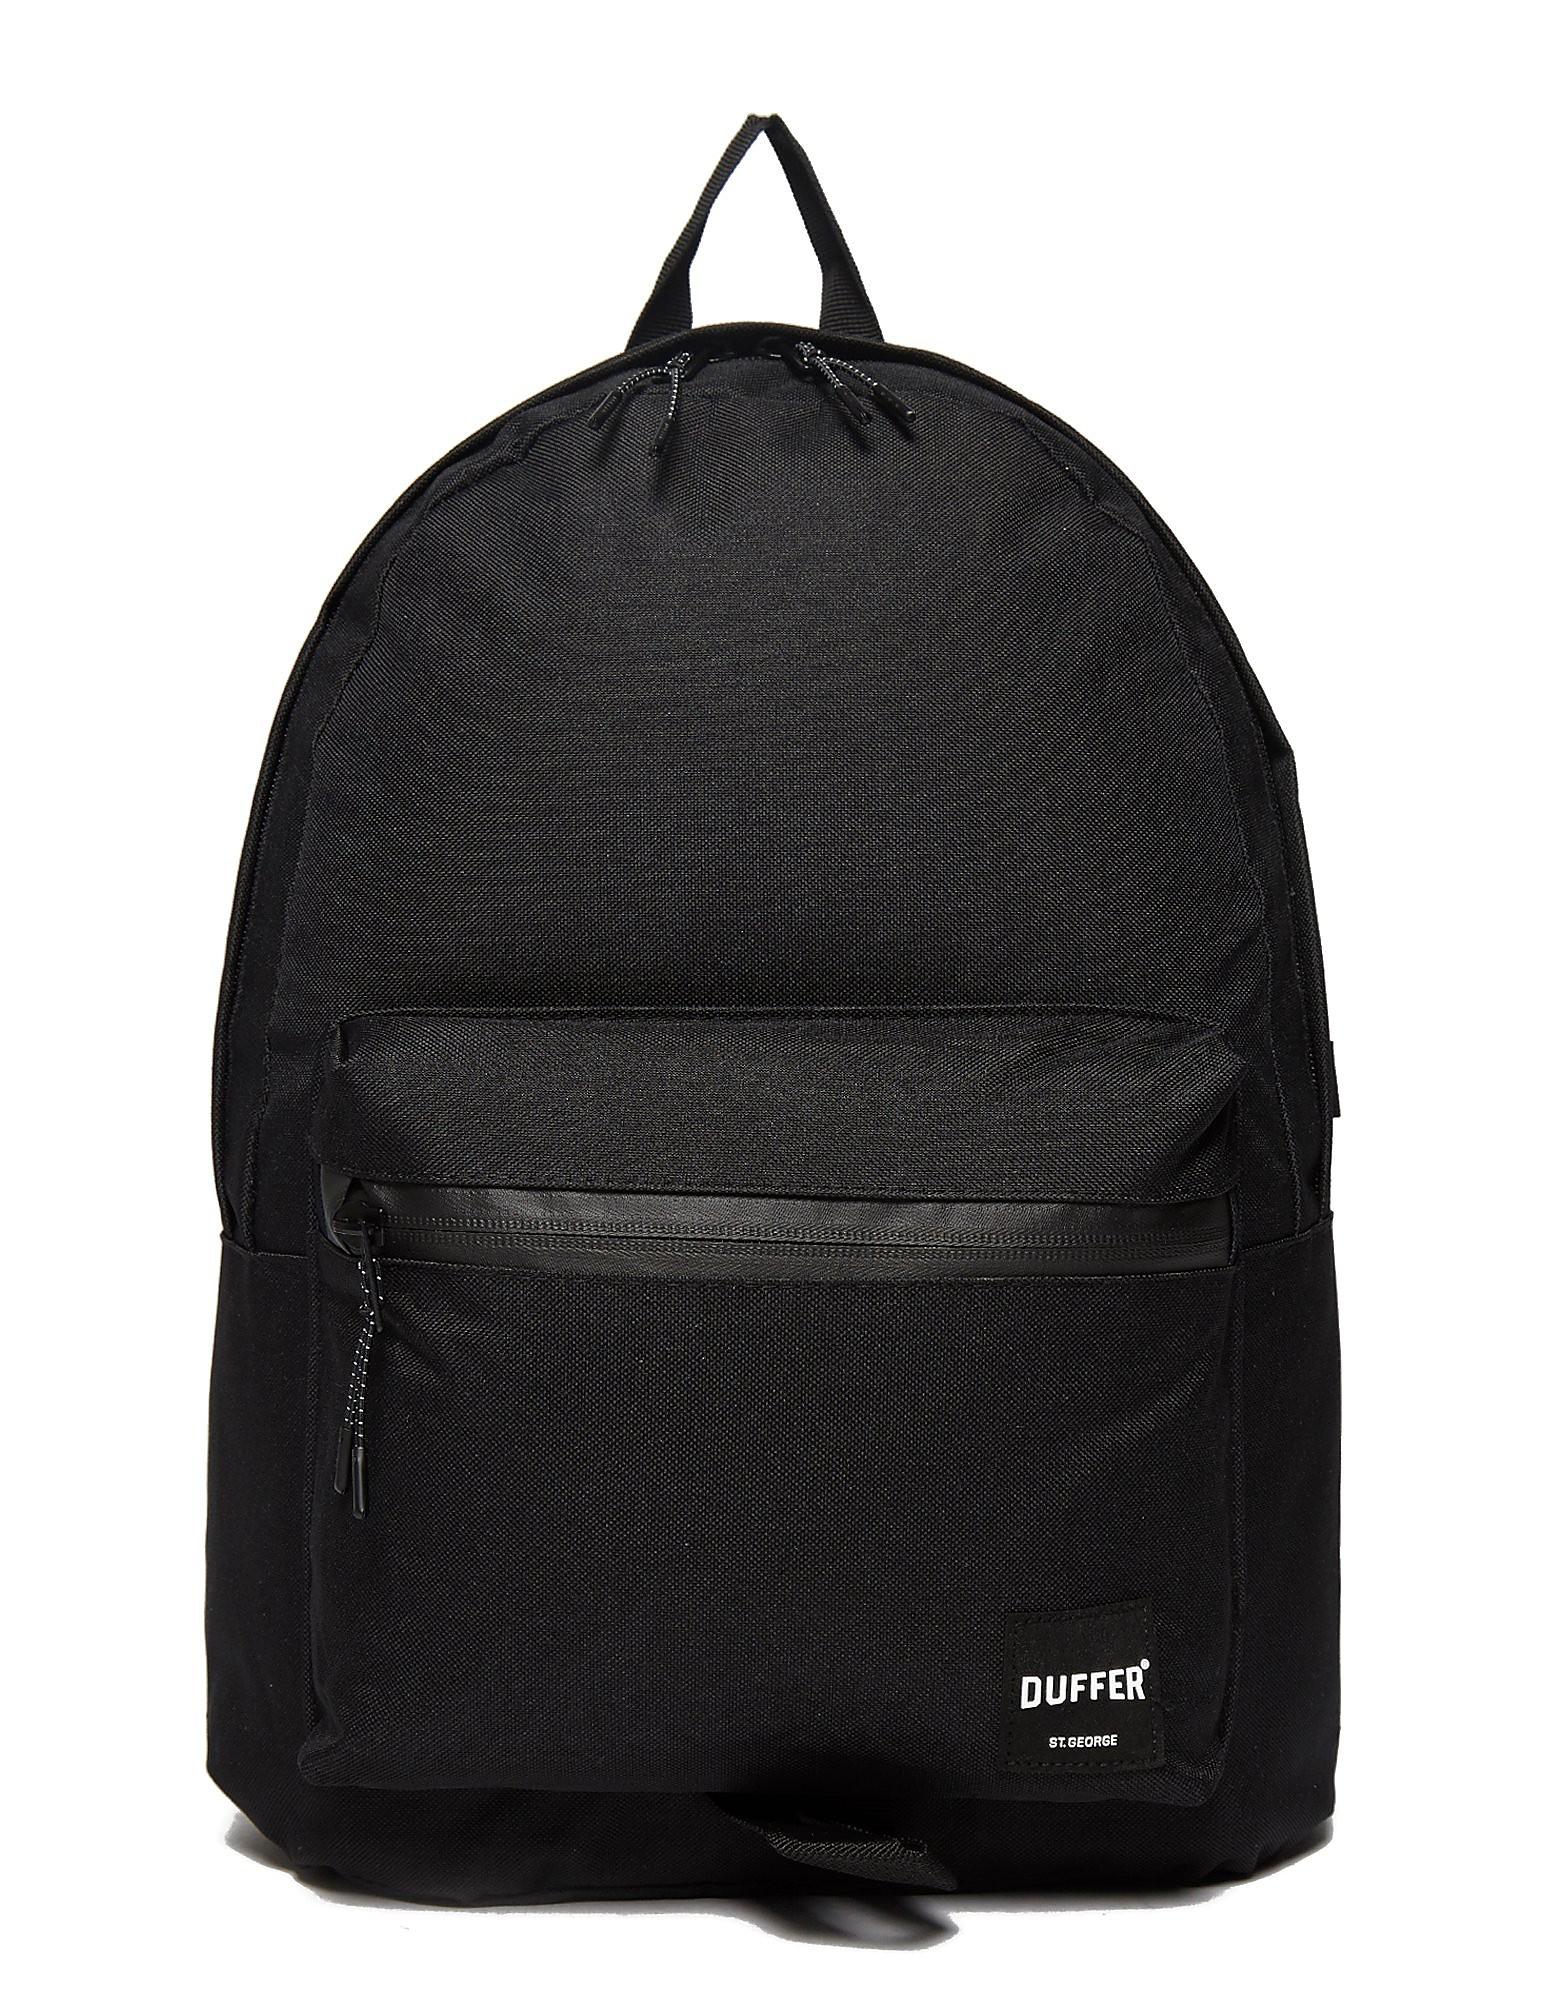 Duffer of St George Black Label Mitel Backpack